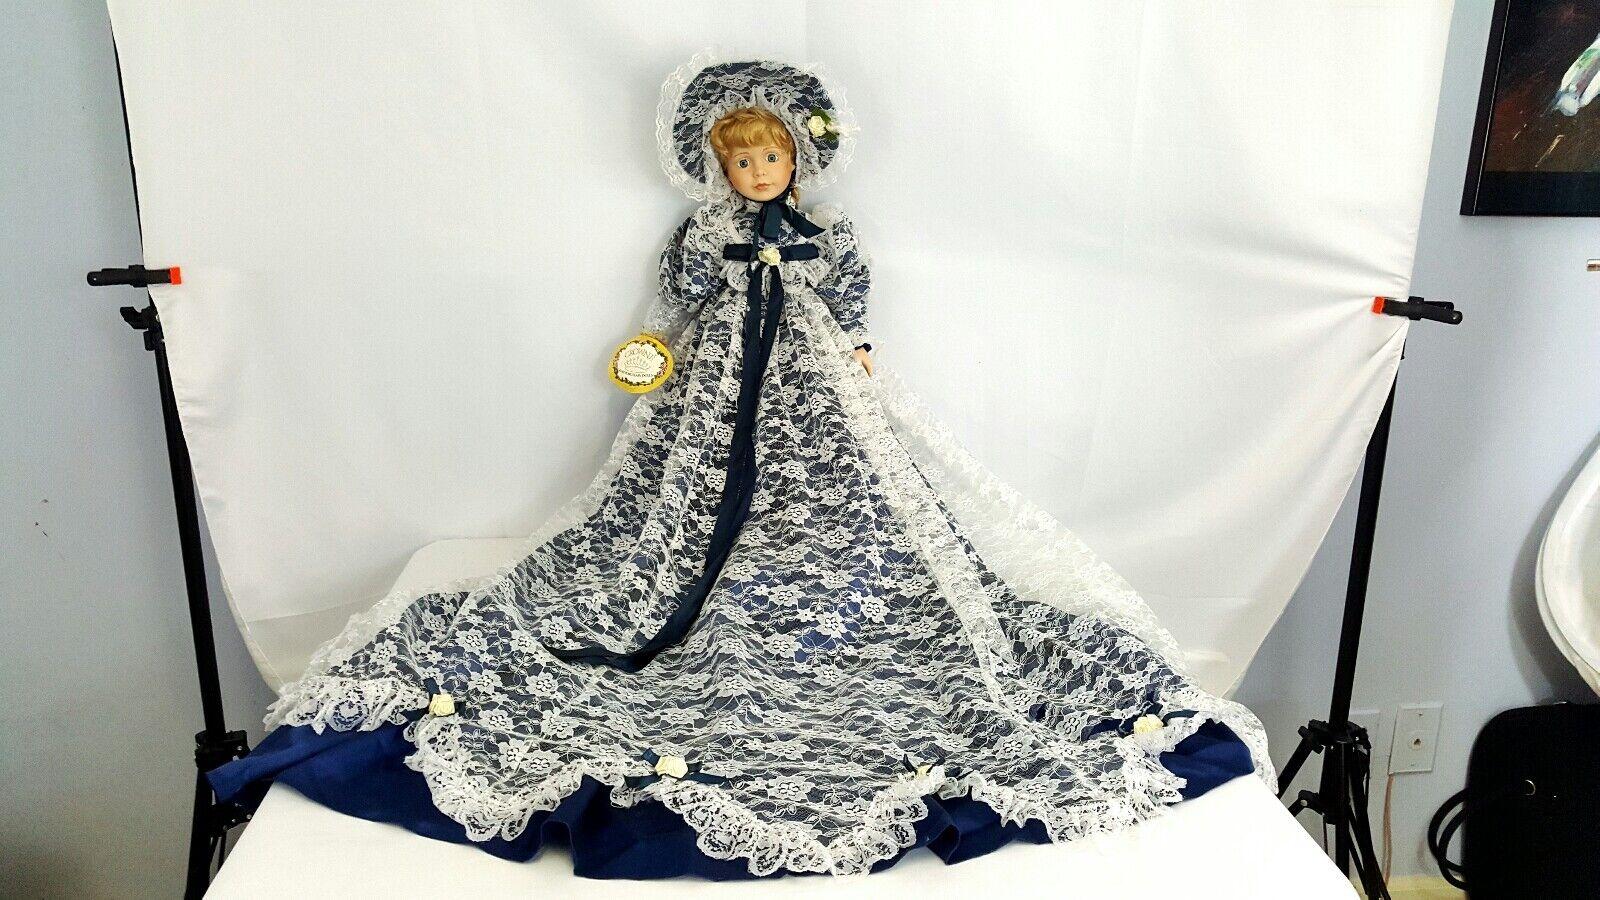 GWENDOLYN  By Crowne Porcelain 25'' bambola Vintage  articoli promozionali